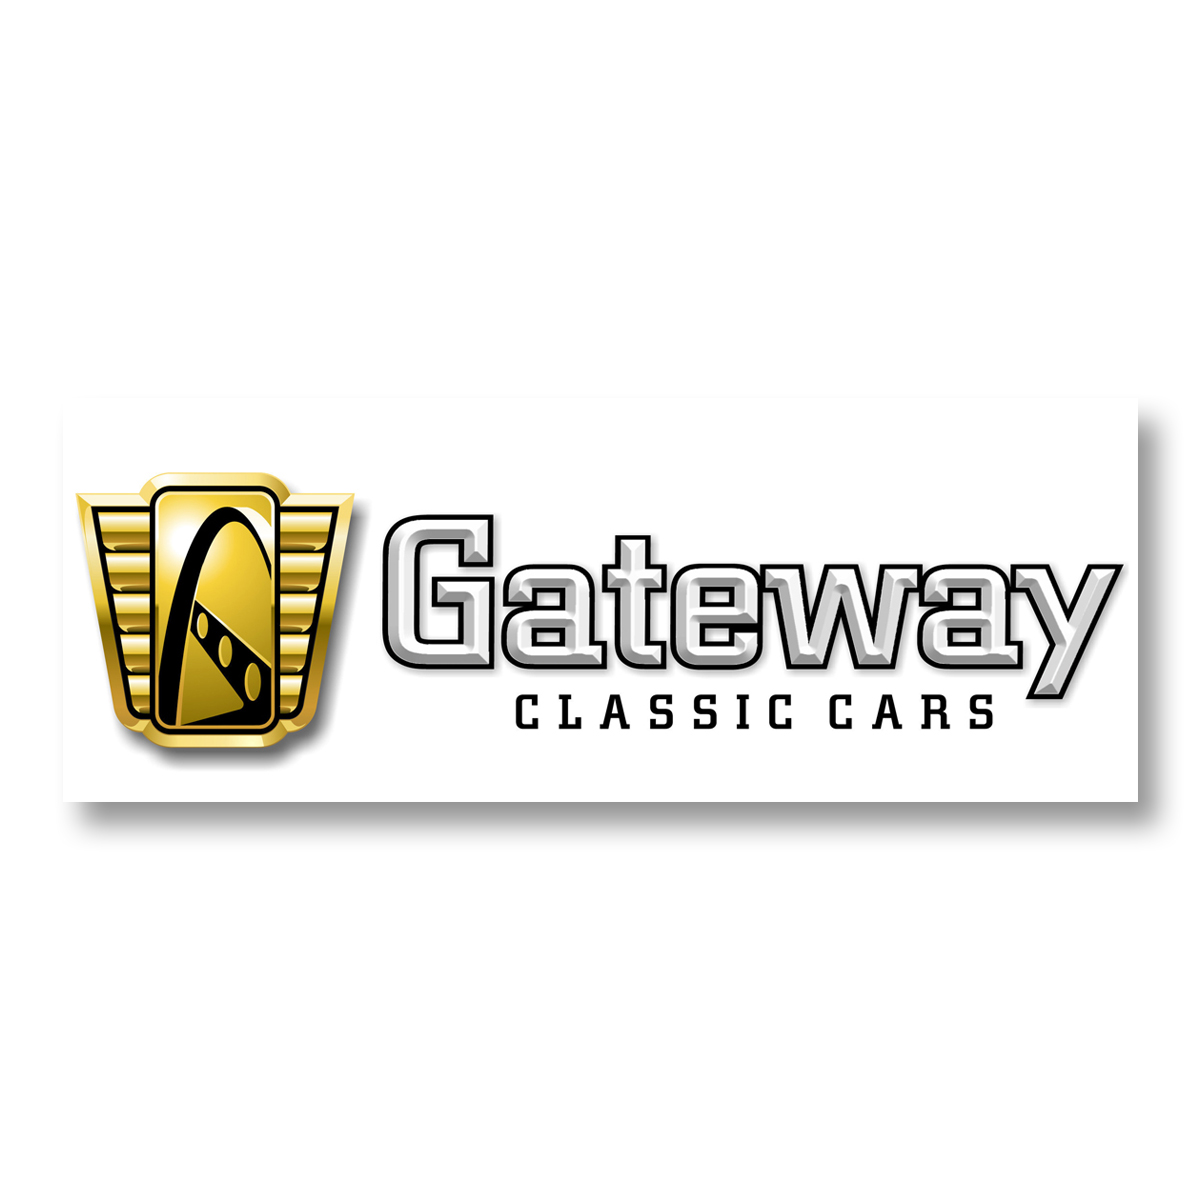 Gateway Classic Cars.jpg